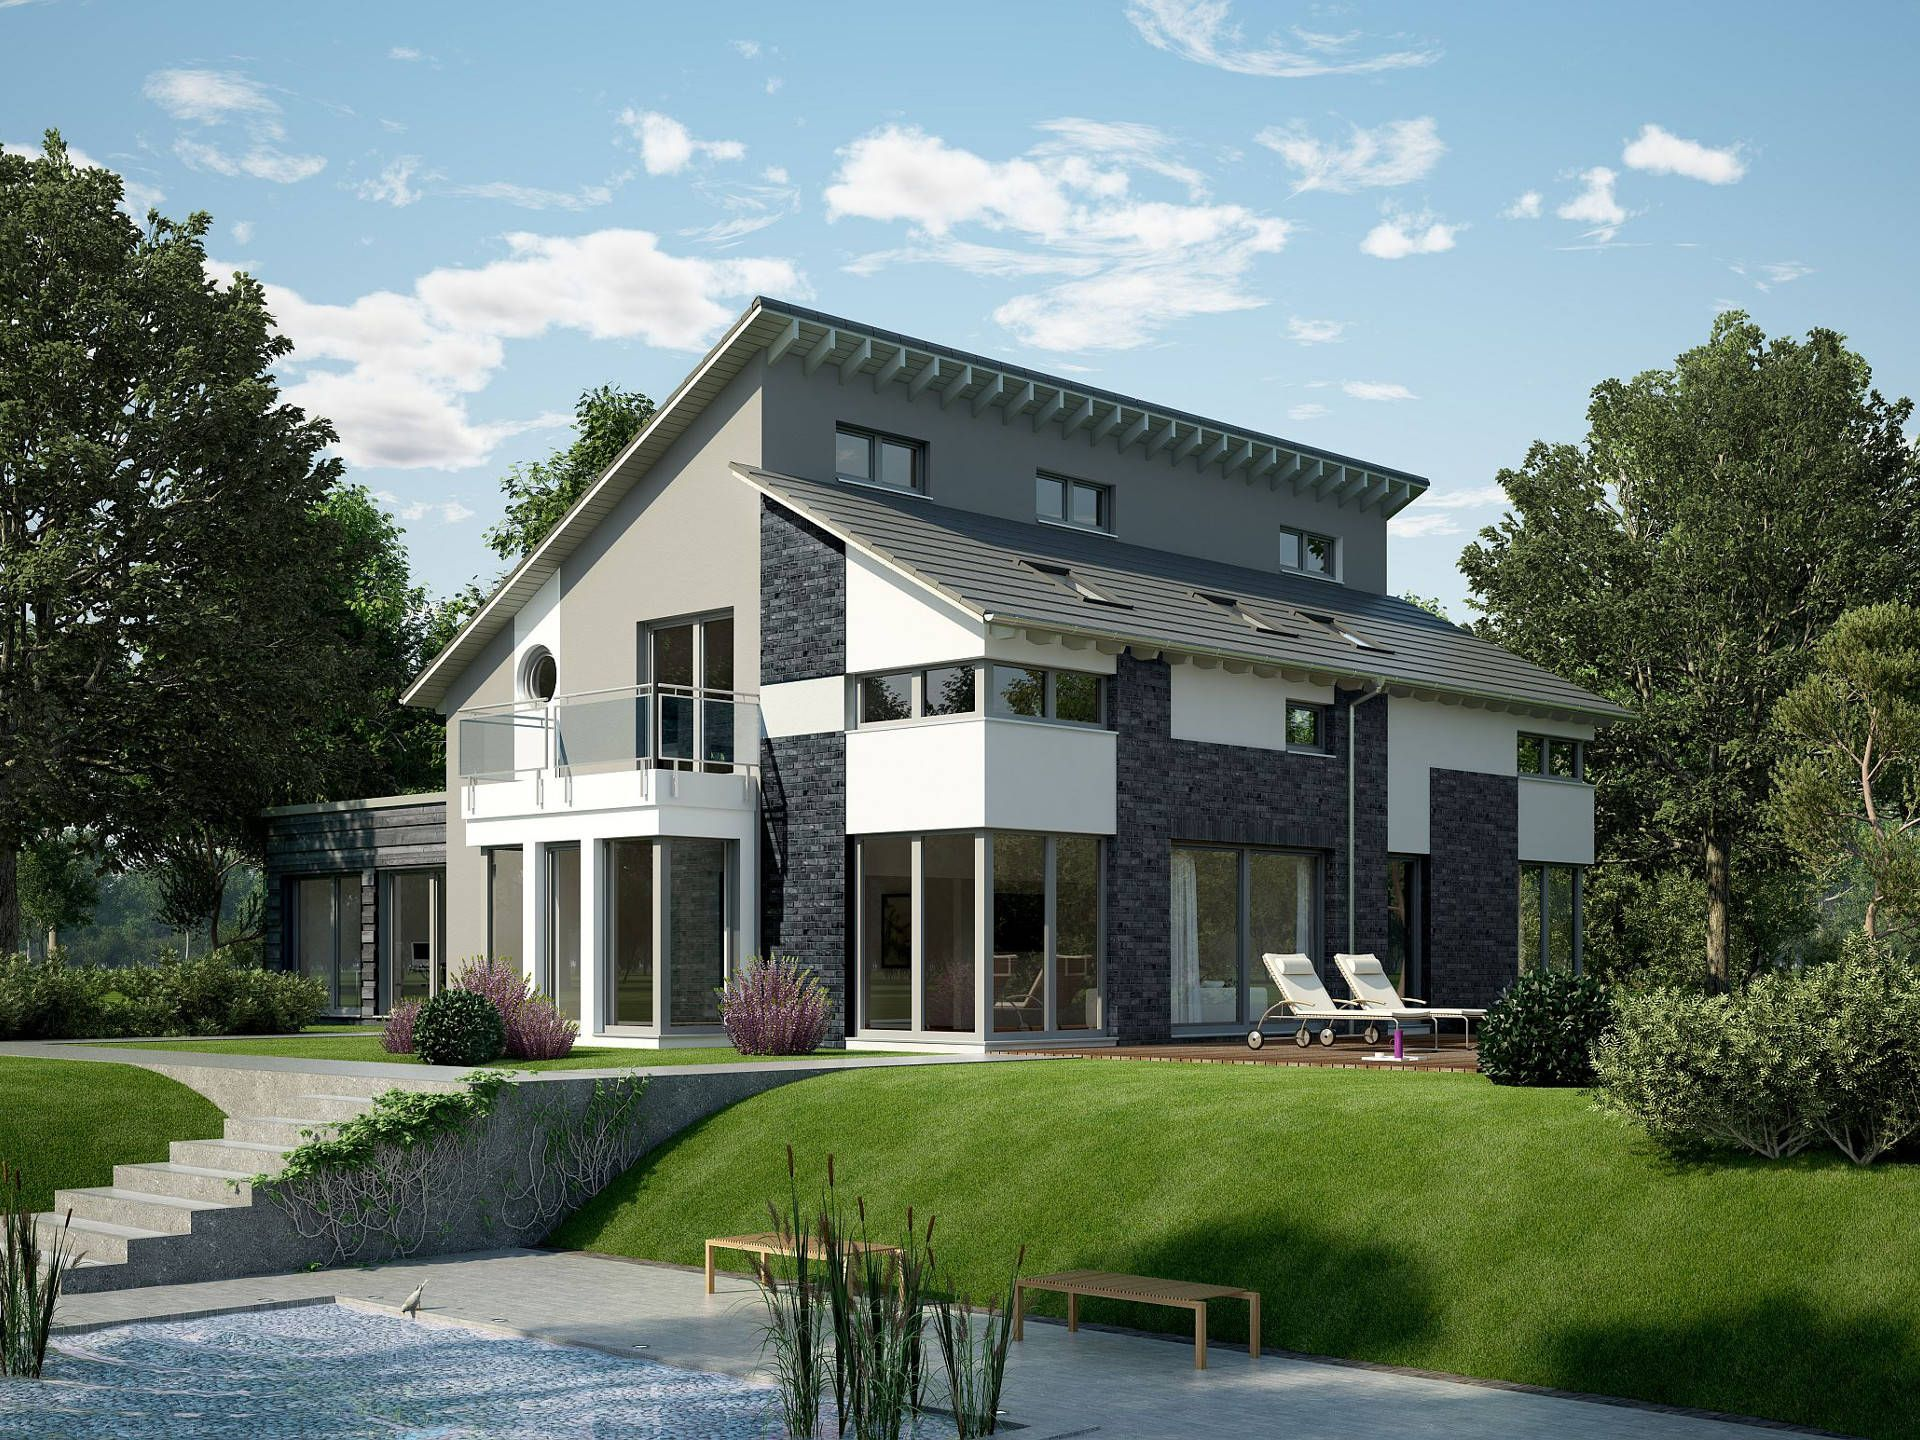 okal haus pultdachhaus bauen pinterest. Black Bedroom Furniture Sets. Home Design Ideas